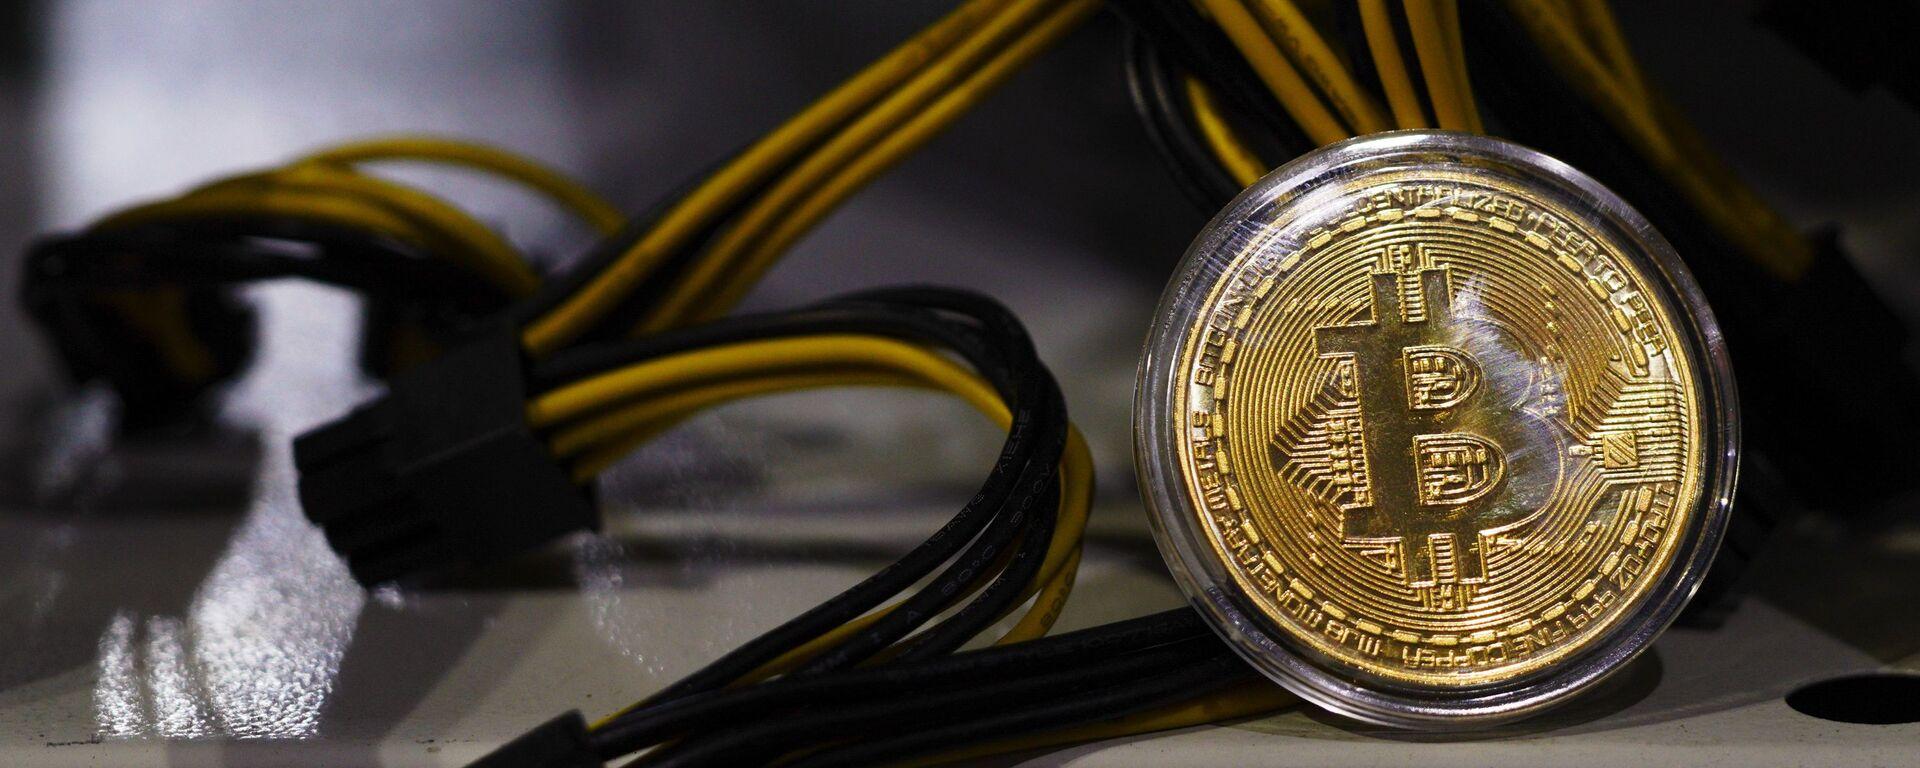 Moneta Bitcoin - Sputnik Italia, 1920, 21.12.2020